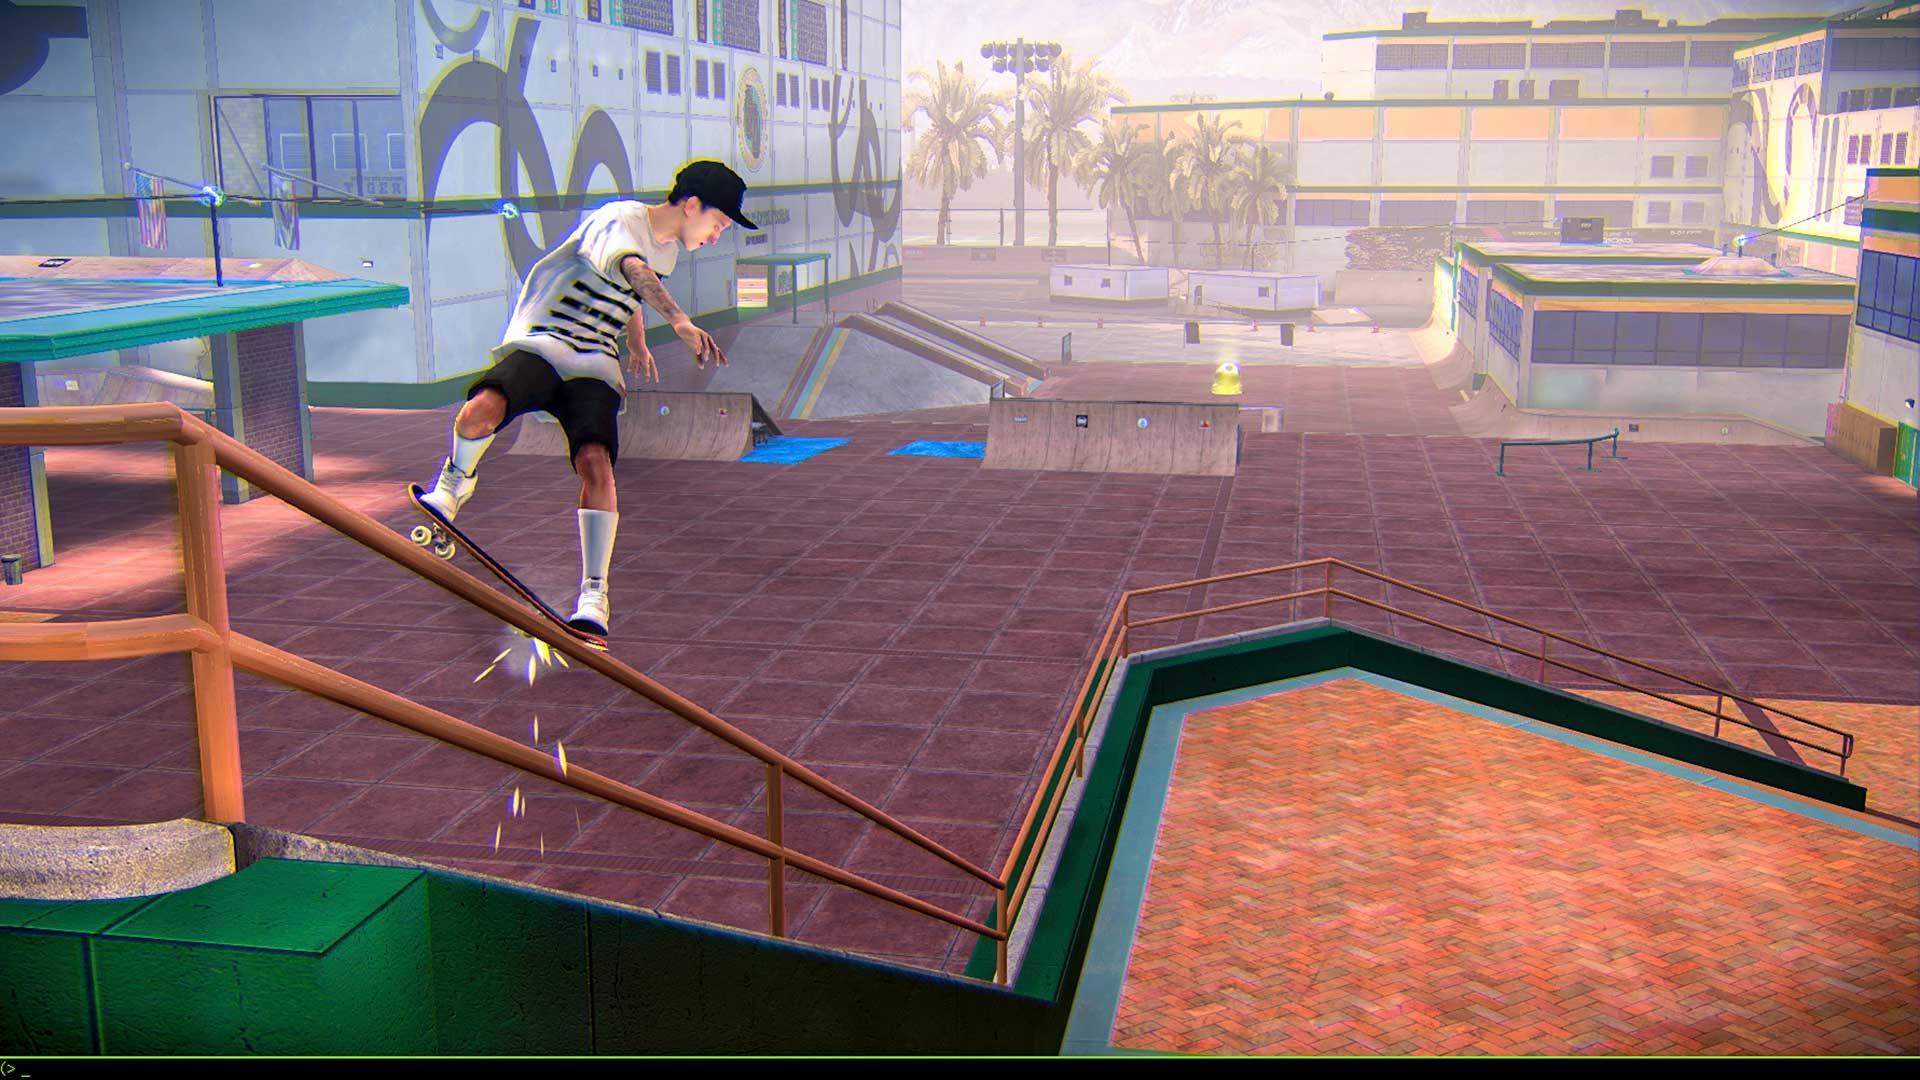 Get A Behind The Scene Look At Tony Hawk Pro Skater 5 Along Pre-Order Bonus Detailed